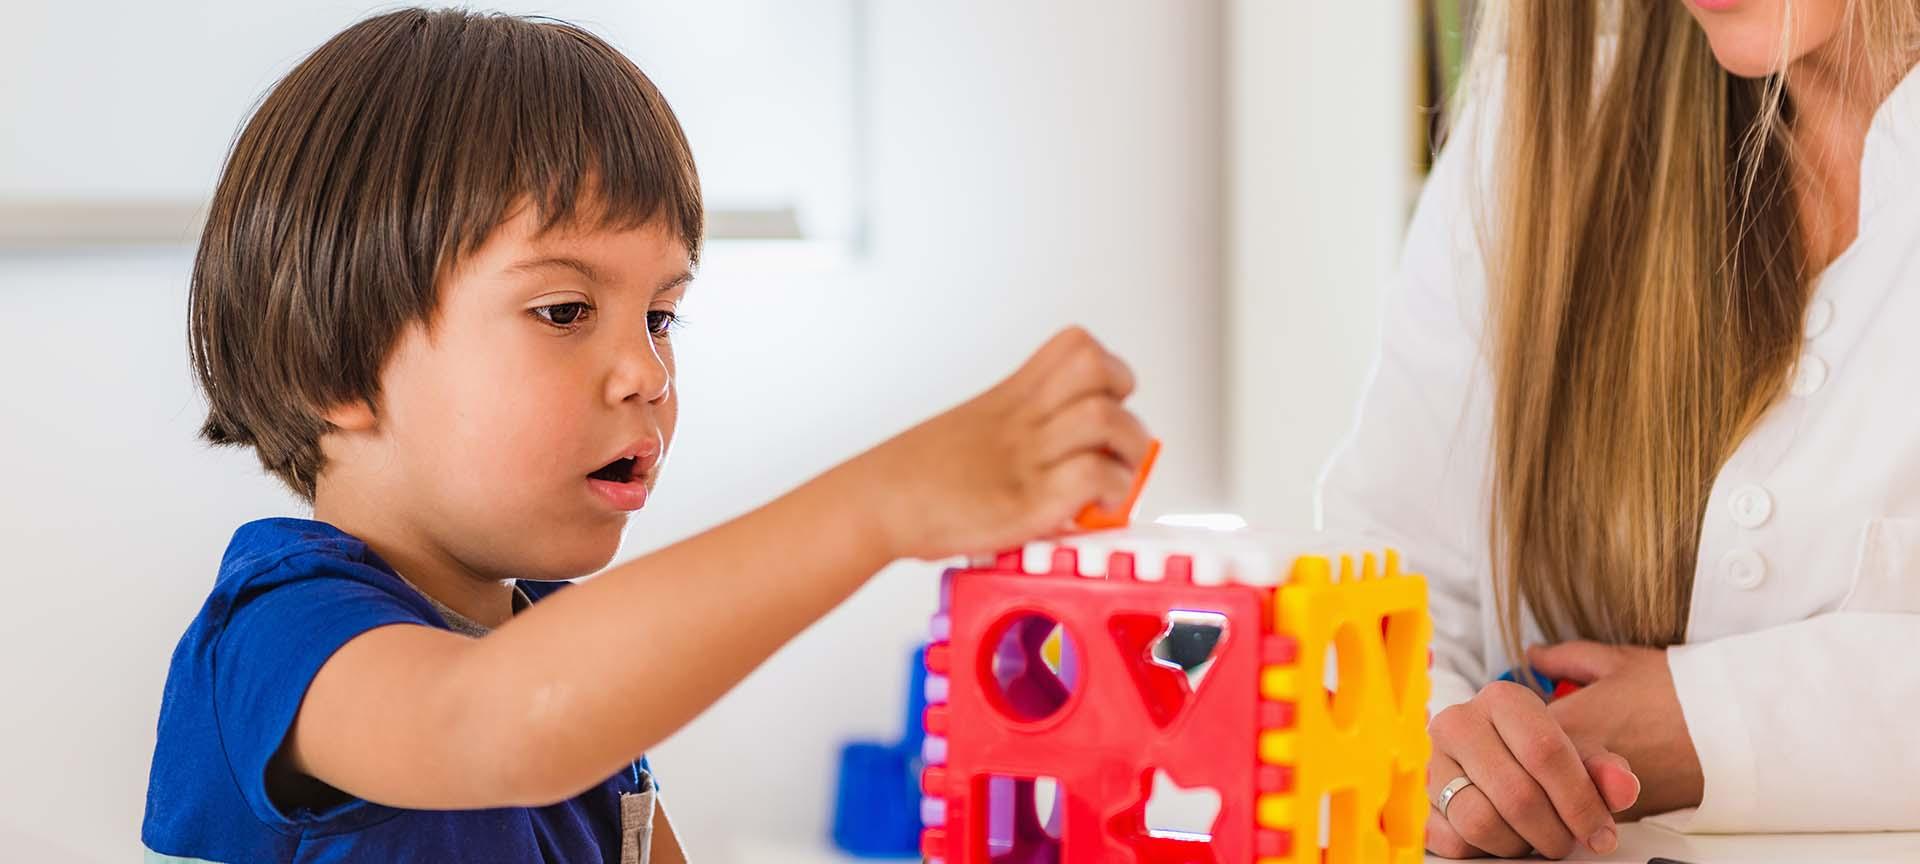 child-psychology-preschooler-doing-test